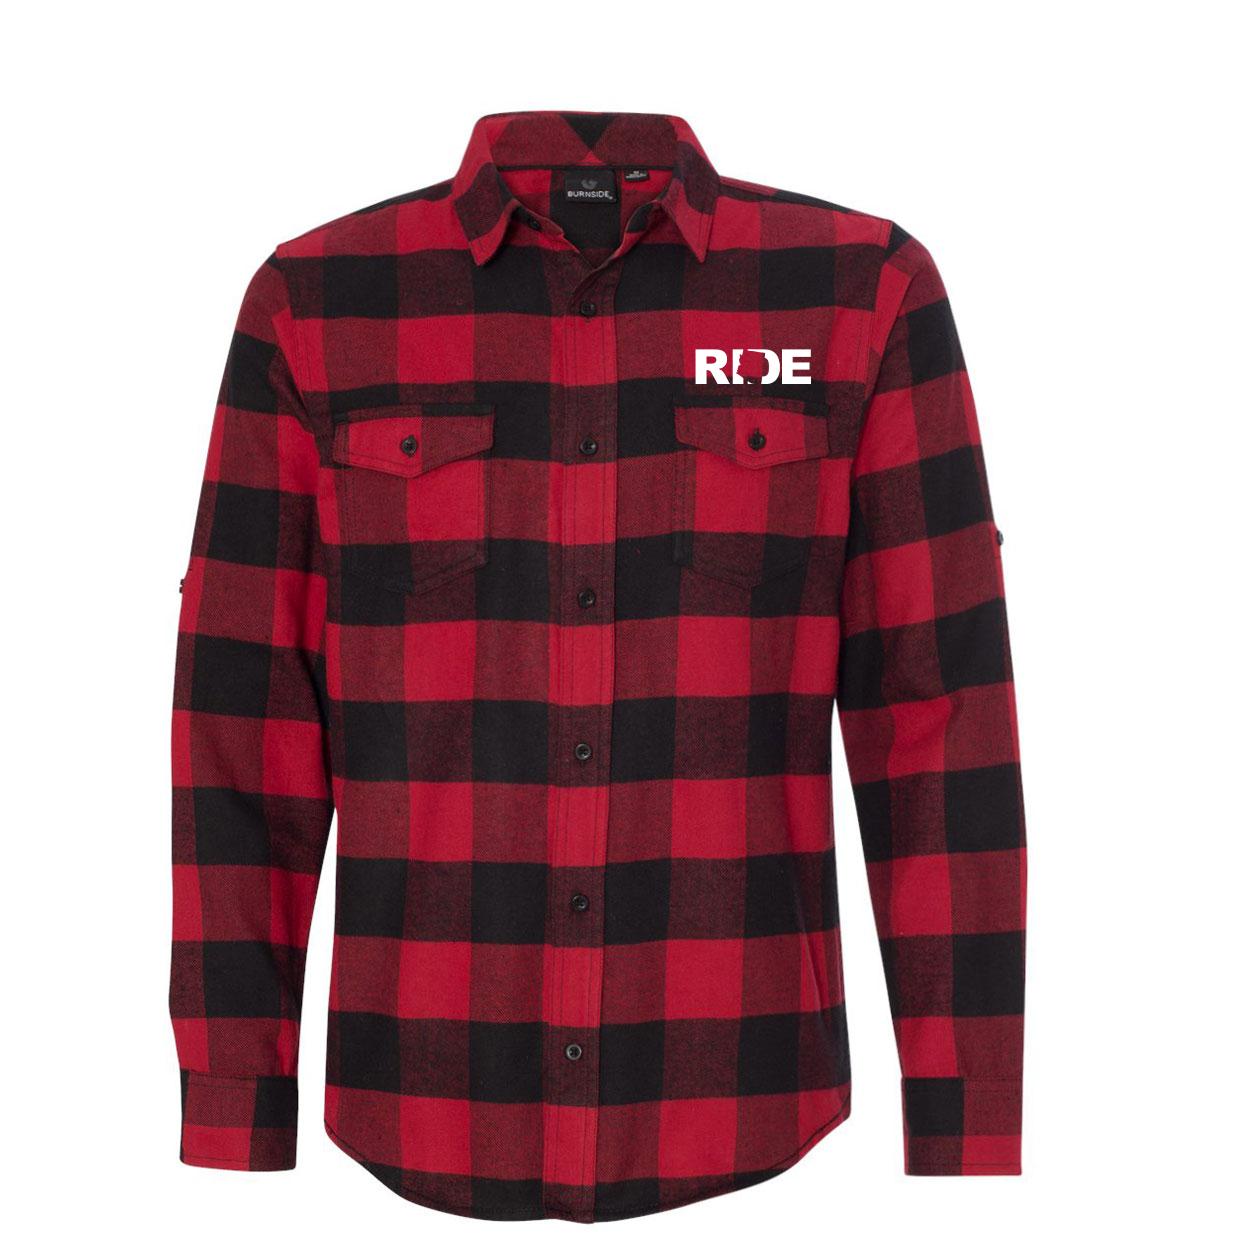 Ride Arizona Classic Unisex Long Sleeve Flannel Shirt Red/Black Buffalo (White Logo)